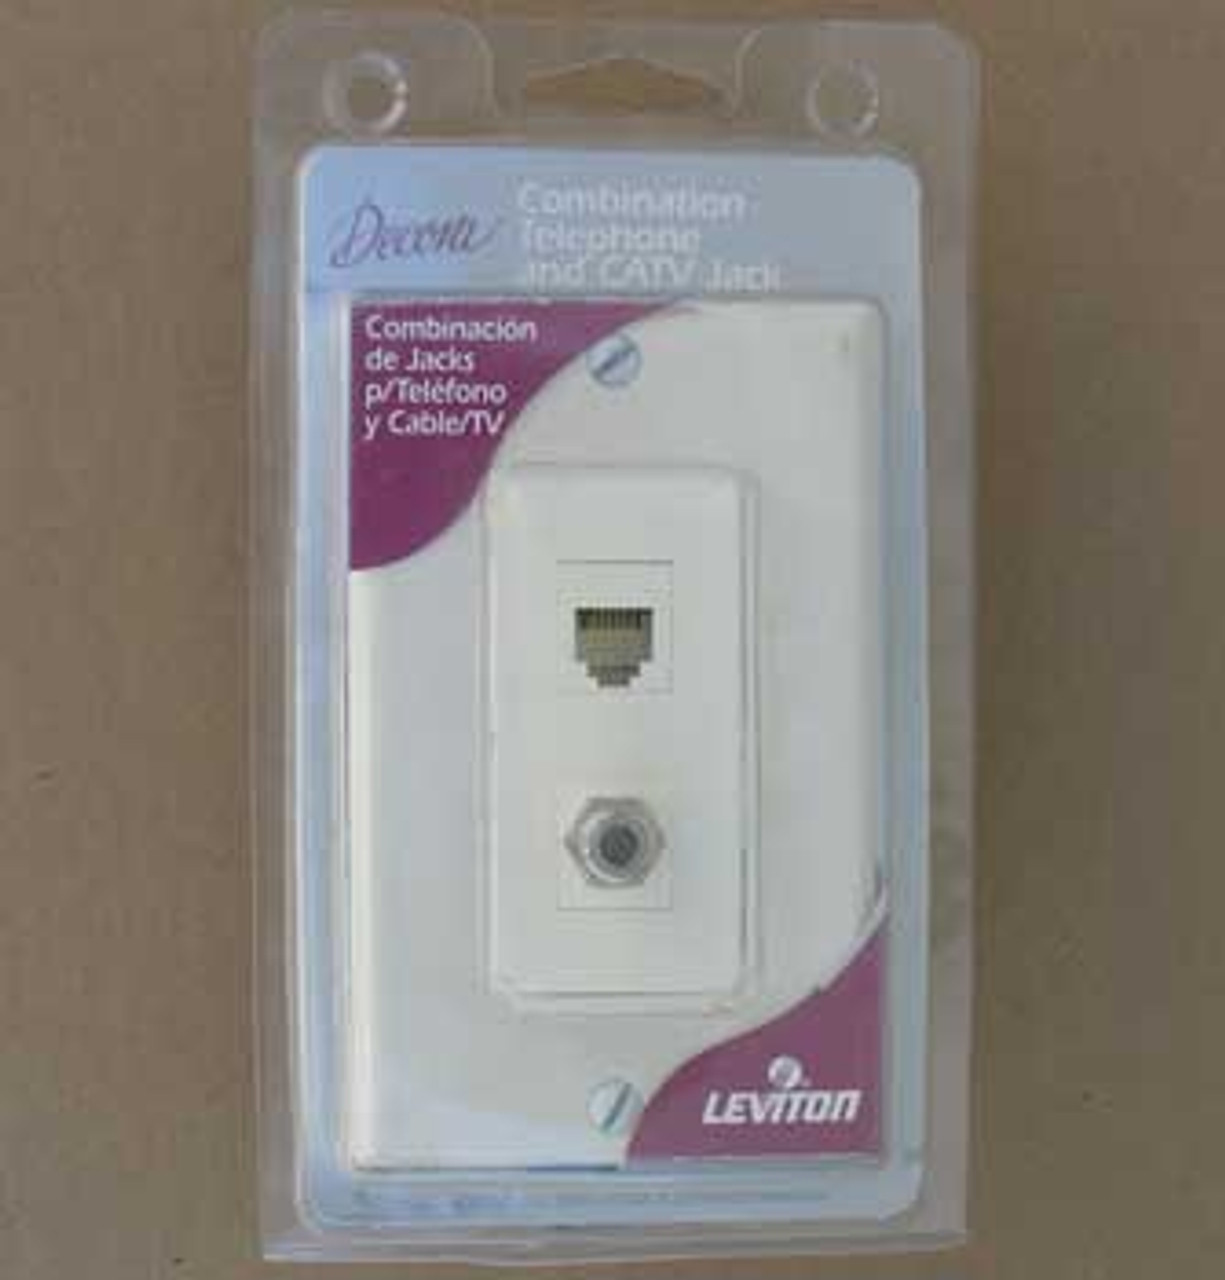 Leviton 41658 Combination Telephone & CATV Jack w/ Wall Plate (Lot of 3)